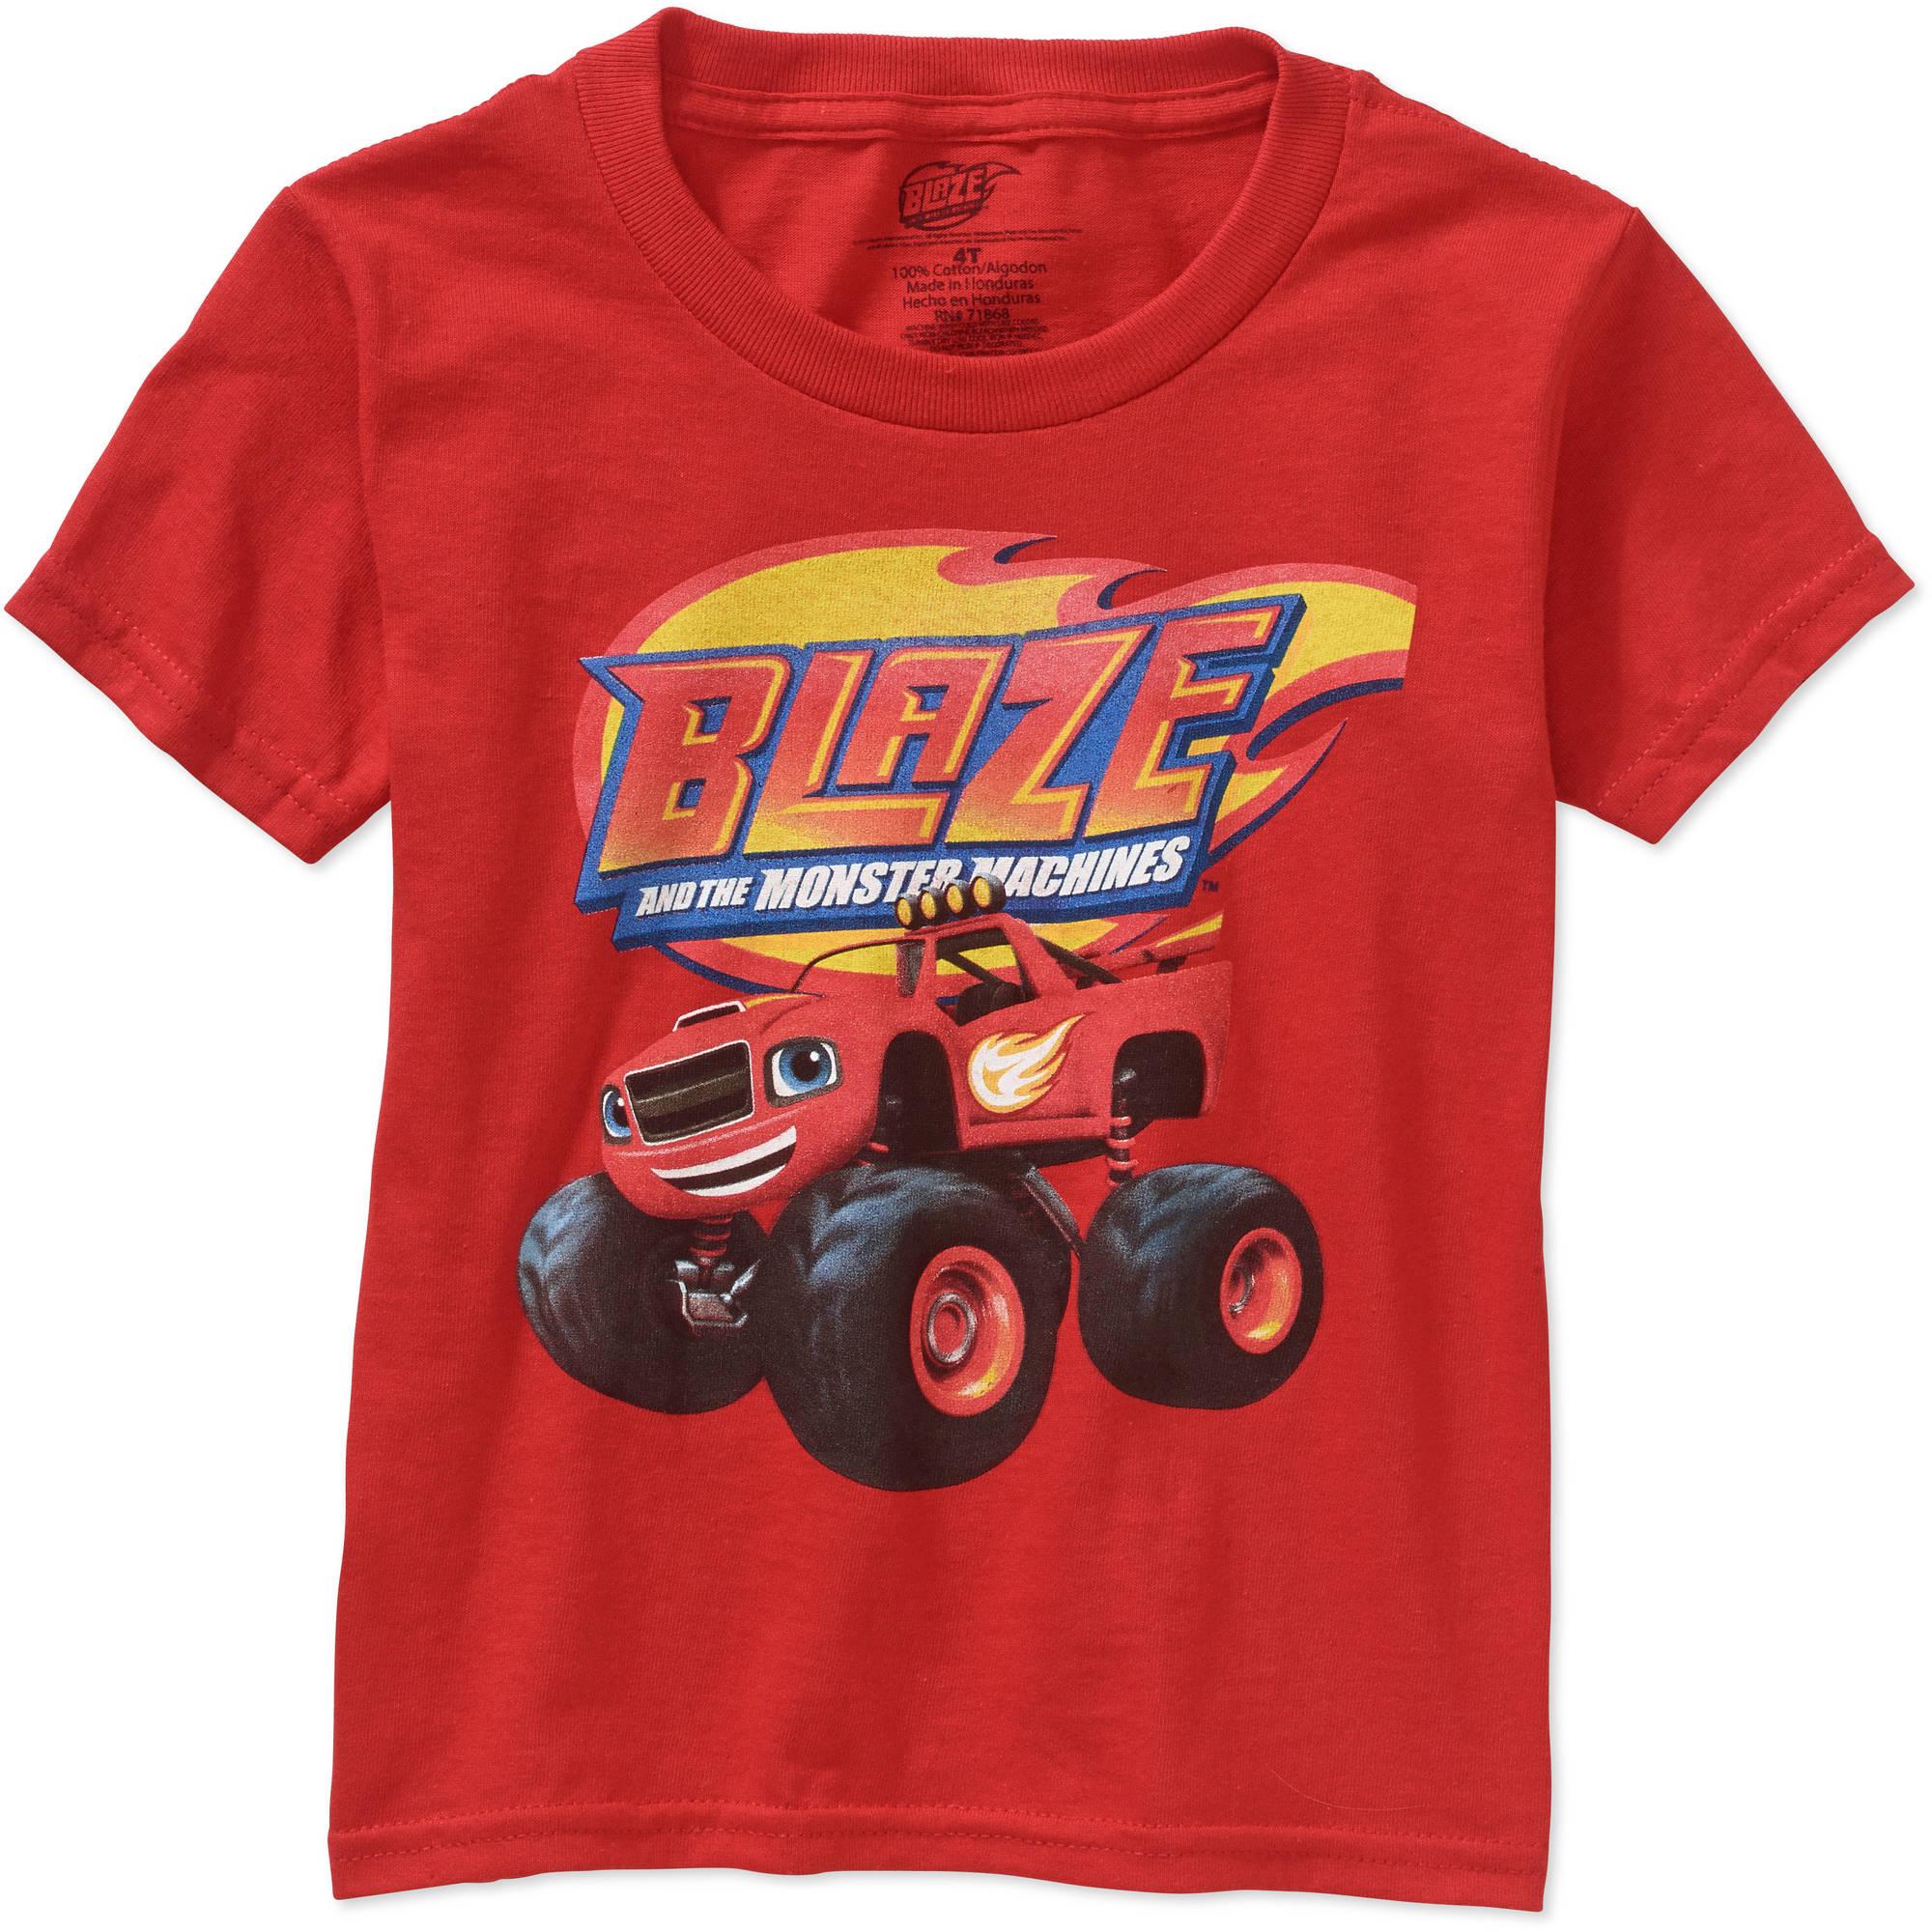 Nickelodeon Blaze The Monster Machines Toddler Boy Short Sleeve Graphic Tee